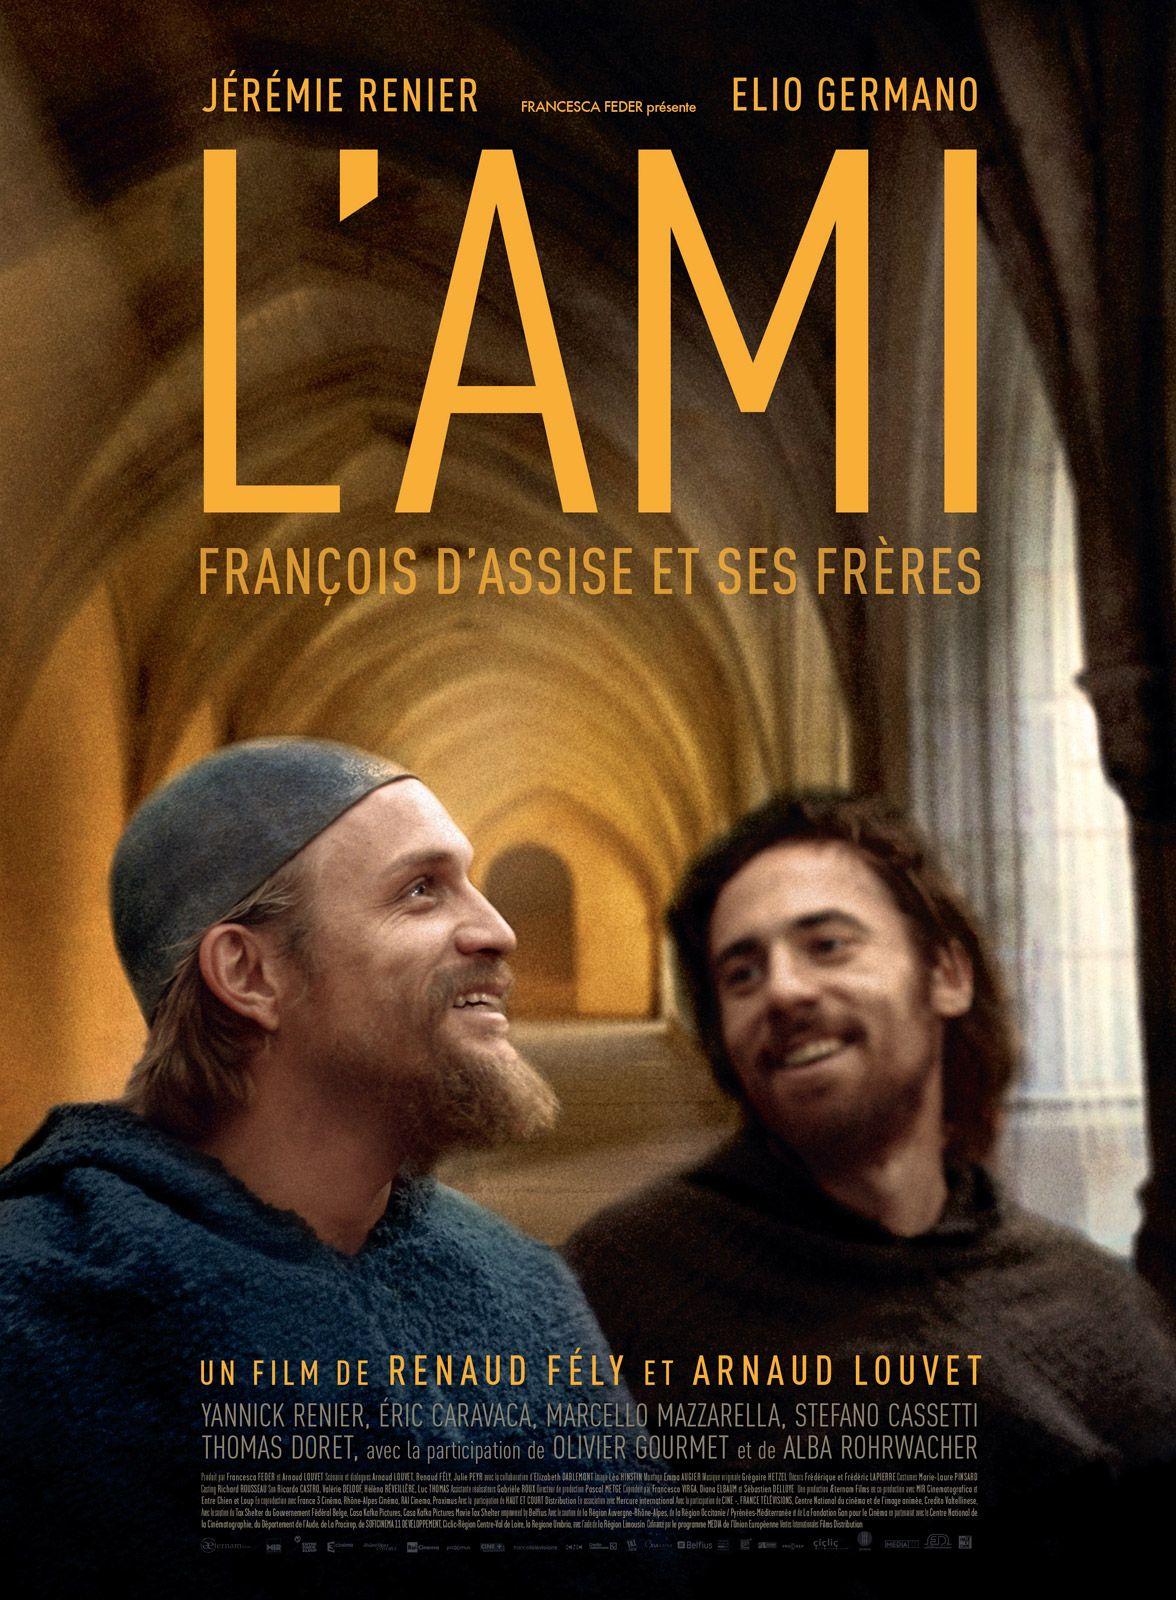 L Ami Francois D Assise Et Ses Freres Francois D Assise Film Olivier Gourmet